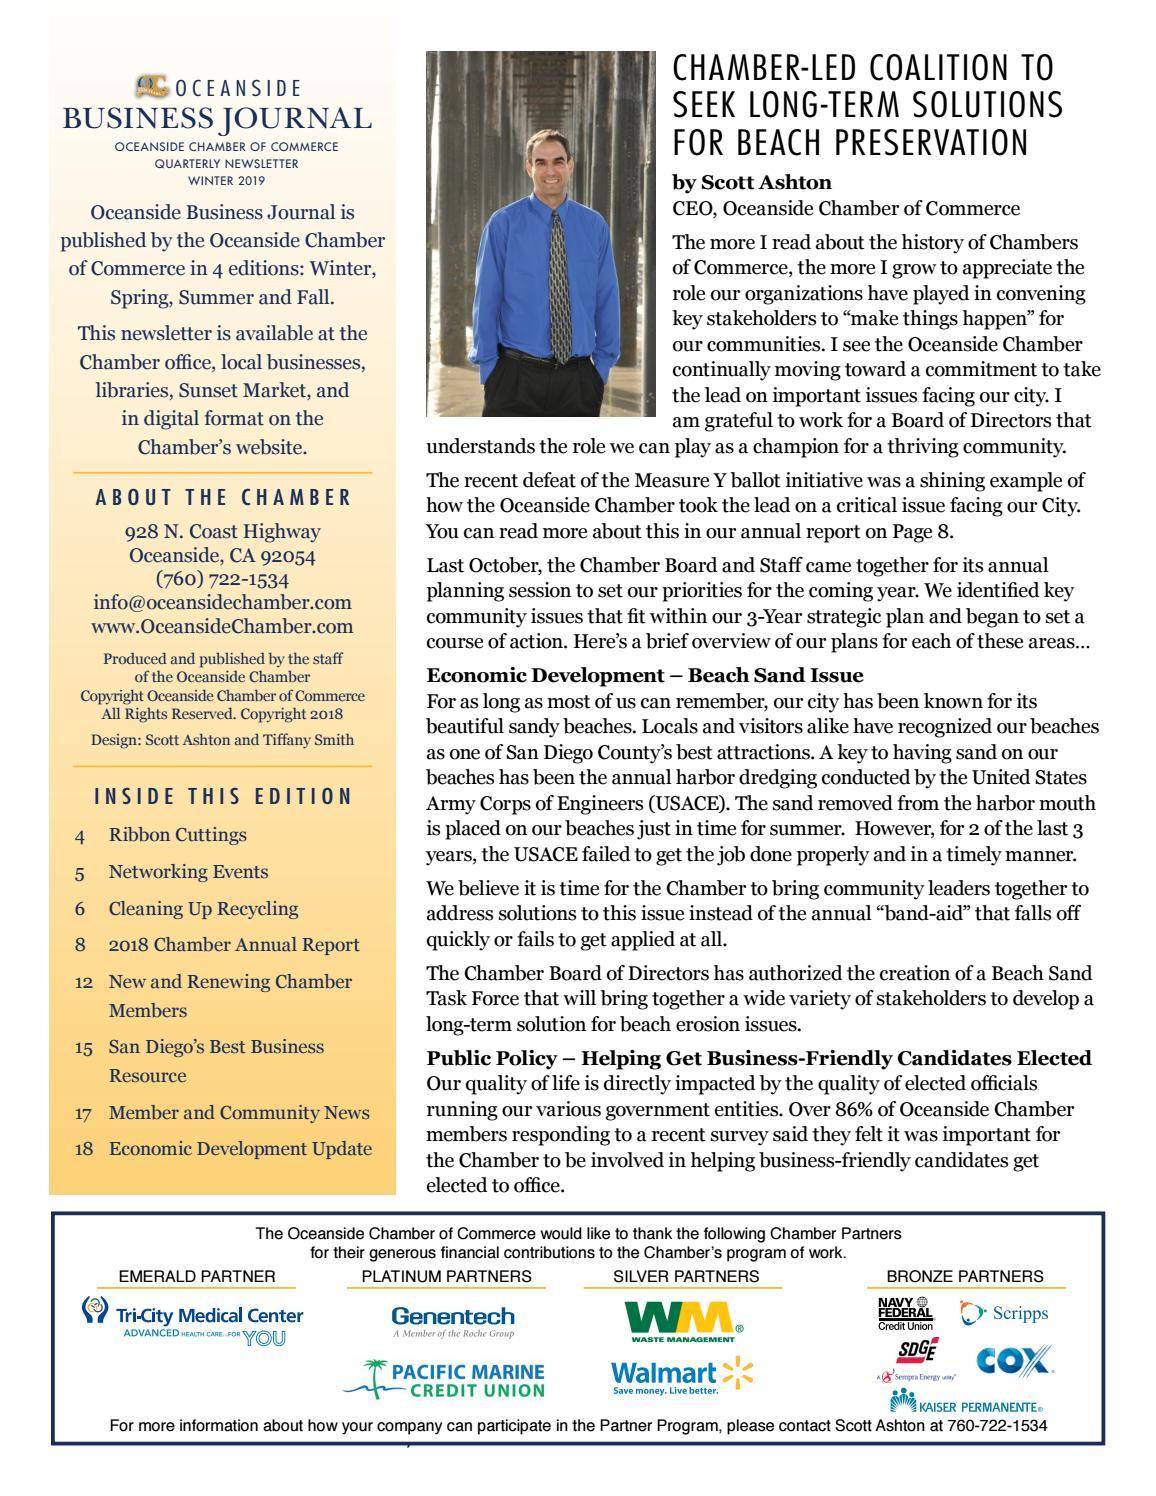 Best of OCEANSIDE Business Journal January 2019 Winter